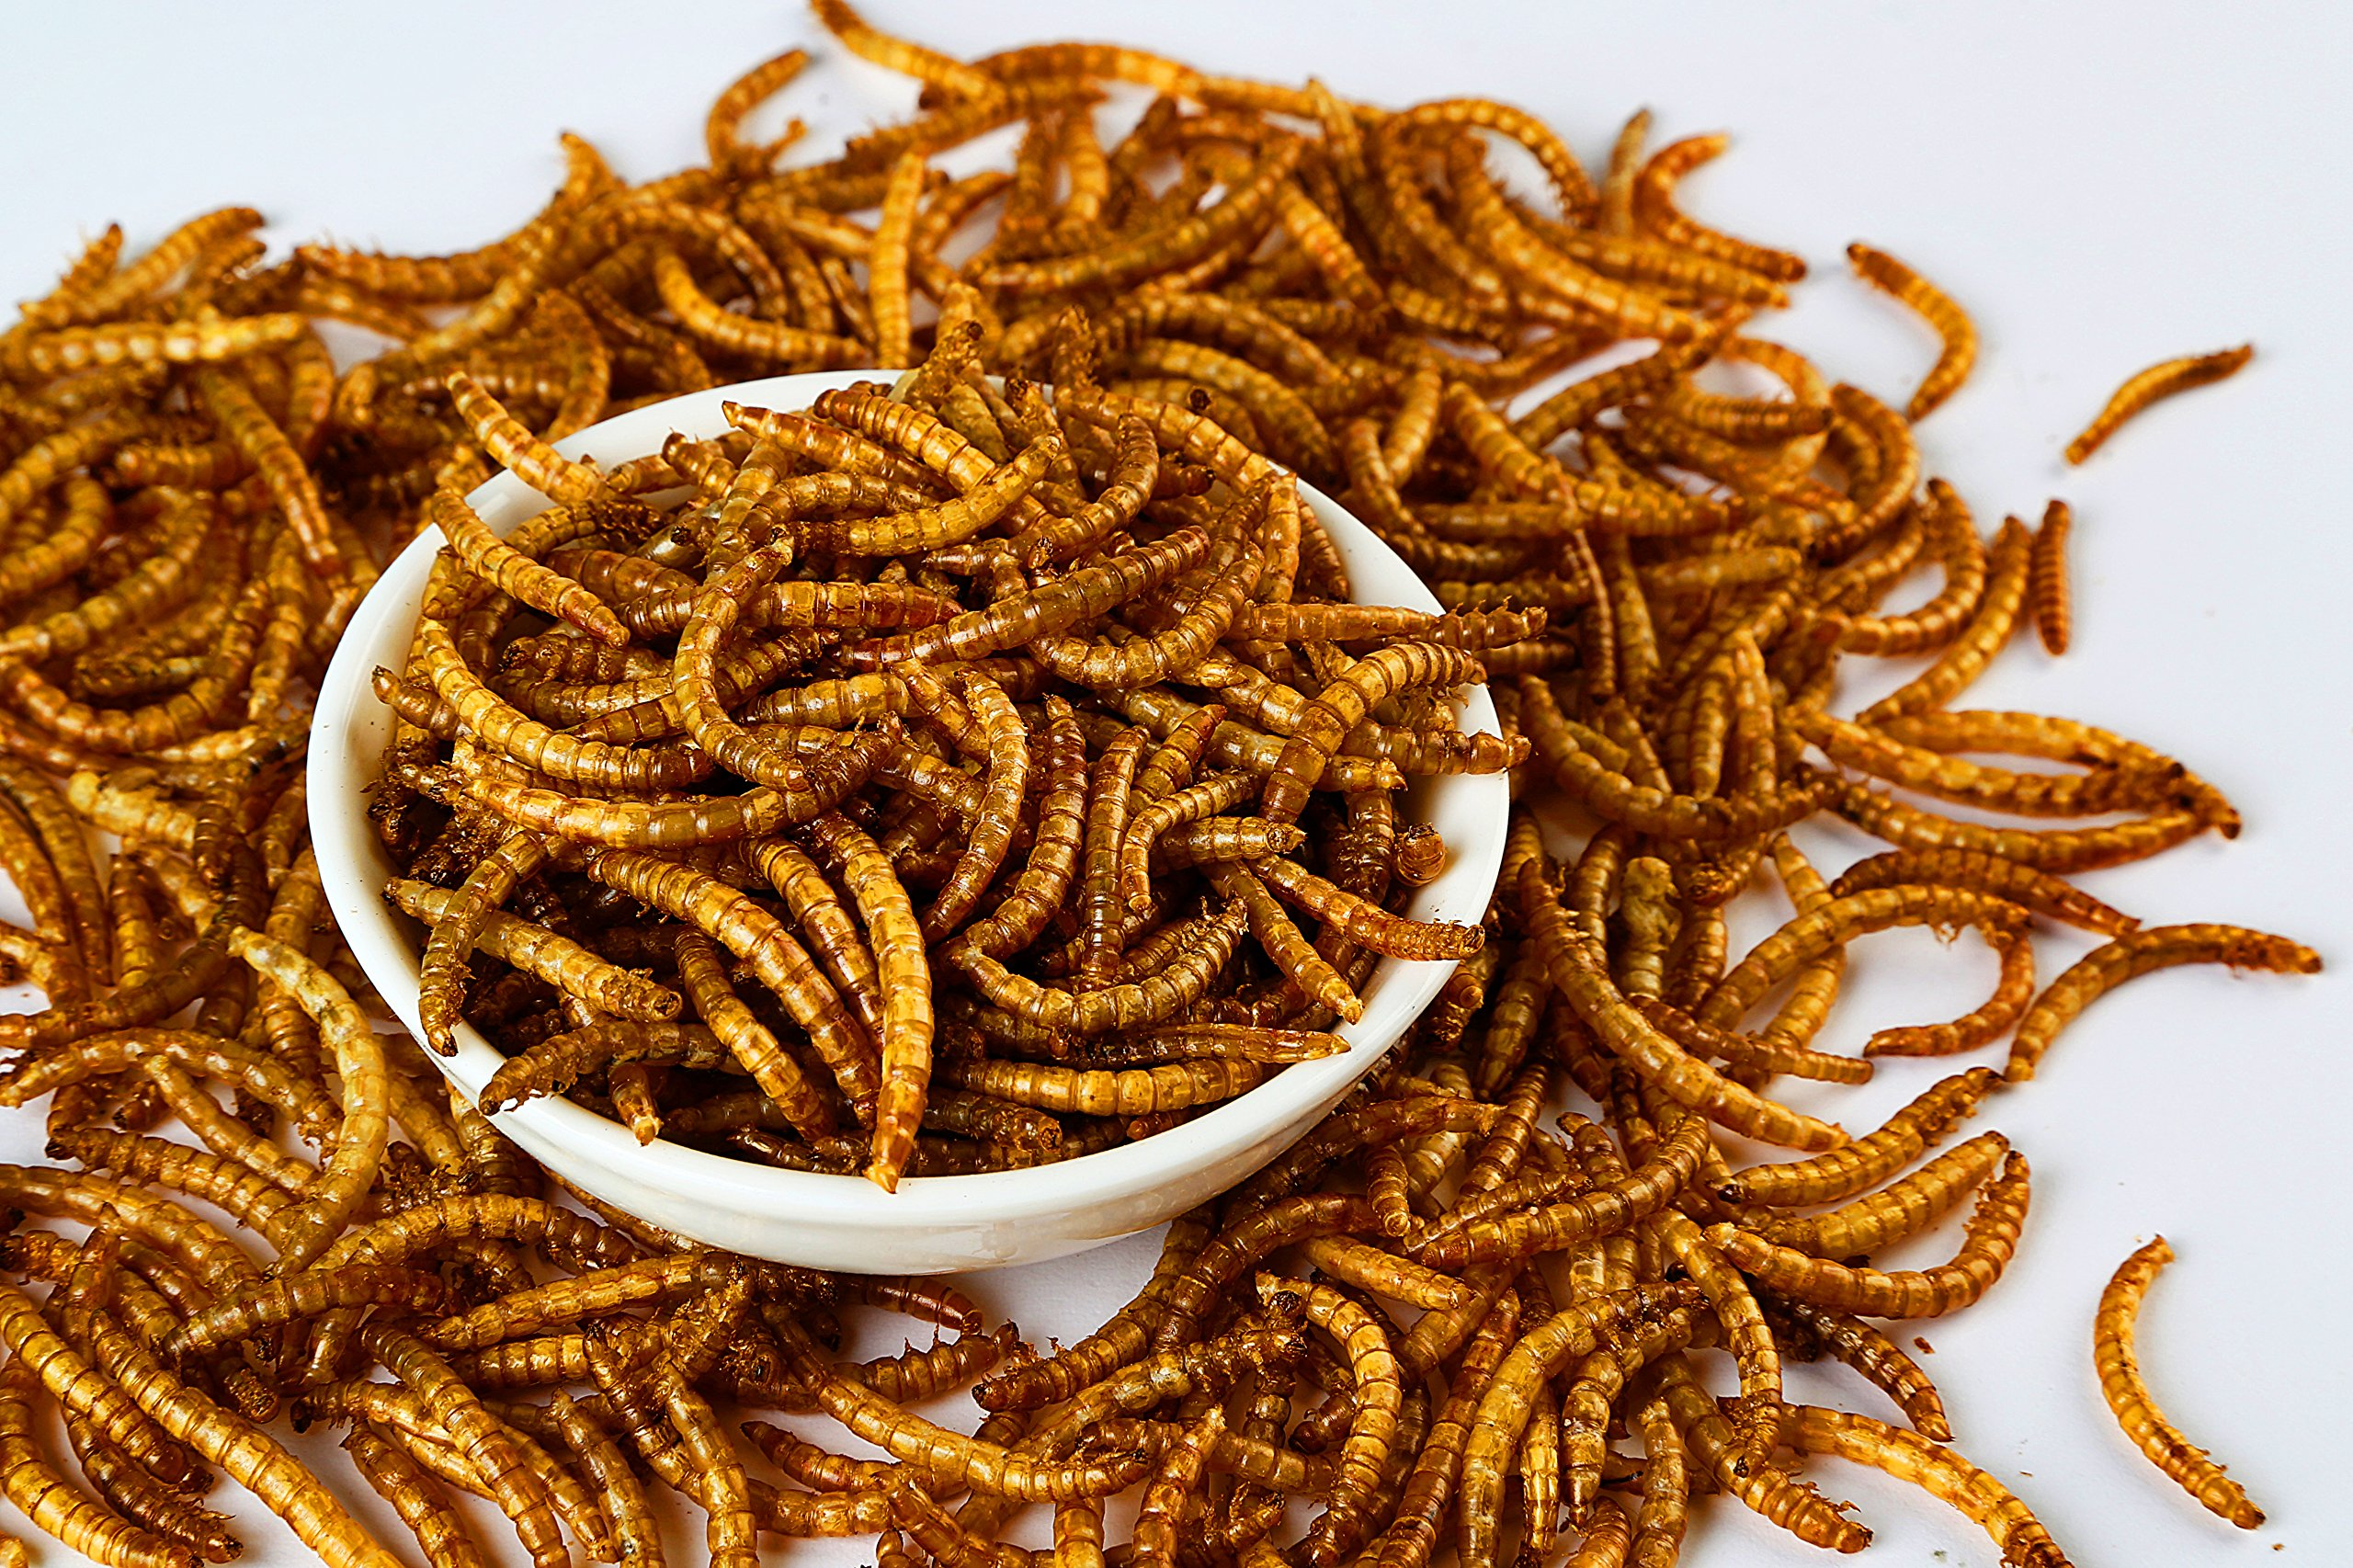 11lbs Bulk Non-GMO Dried Mealworms for Reptile, Tortoise ; Amphibian,Lizard ;Wild Birds; Chichens; Duck etc 3